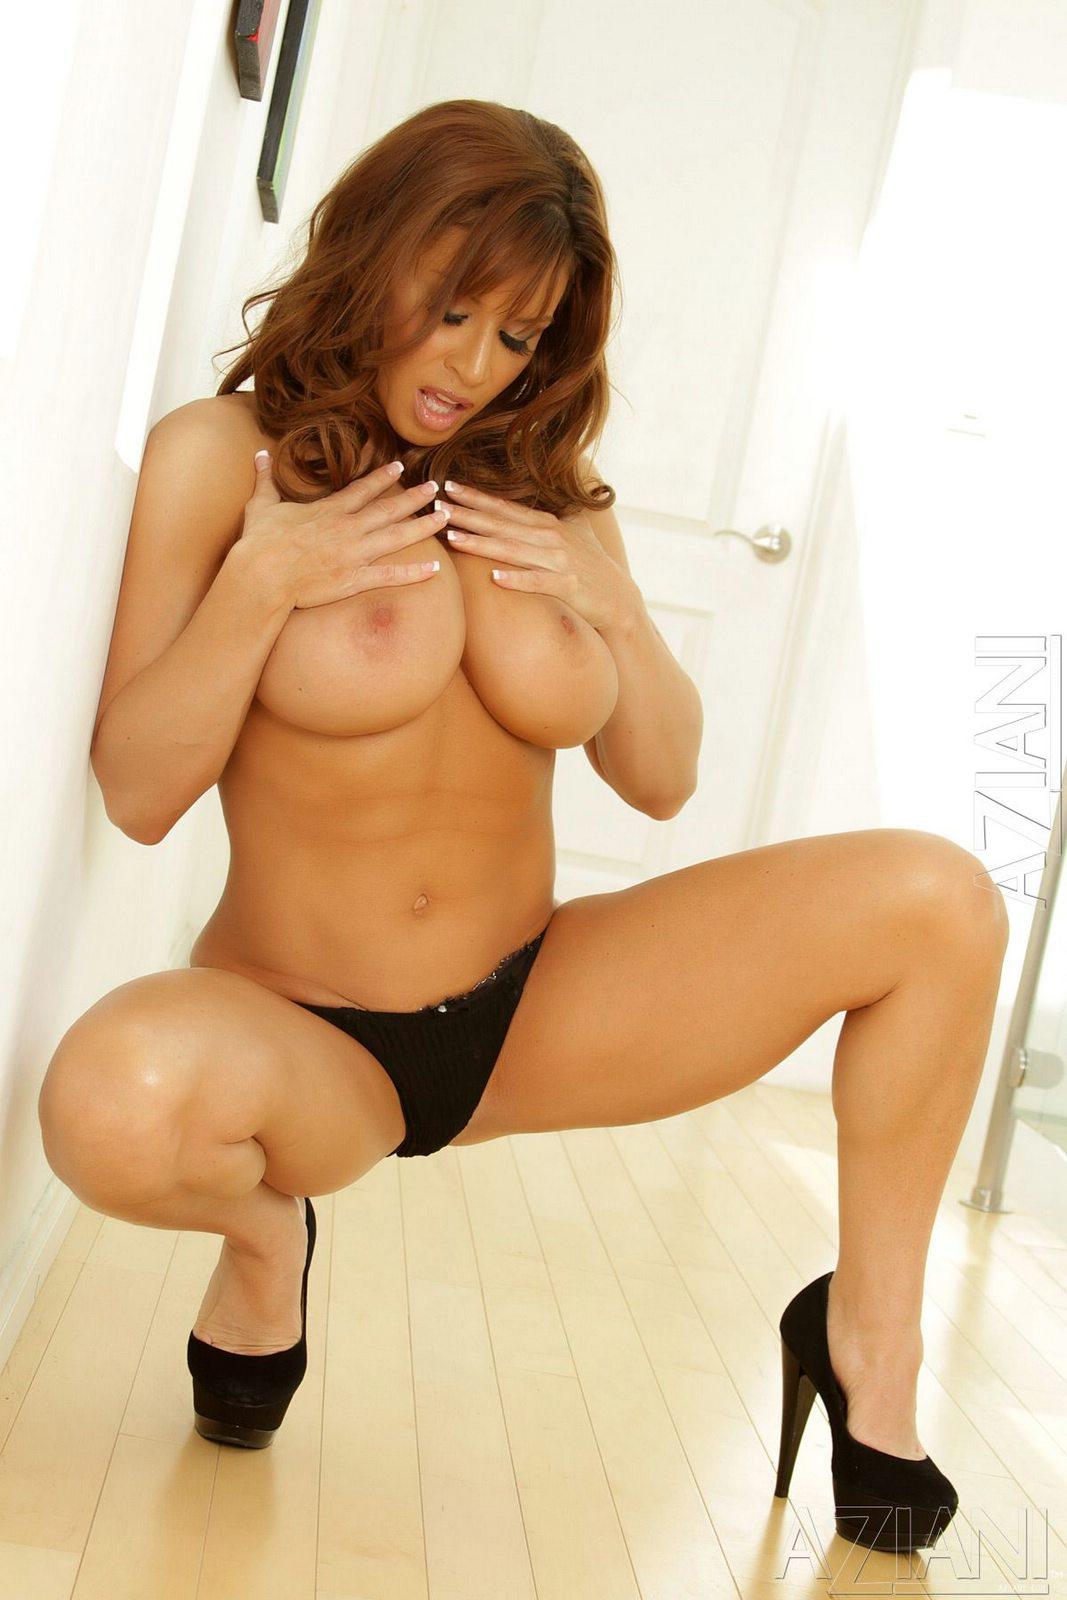 christine smith nude pics